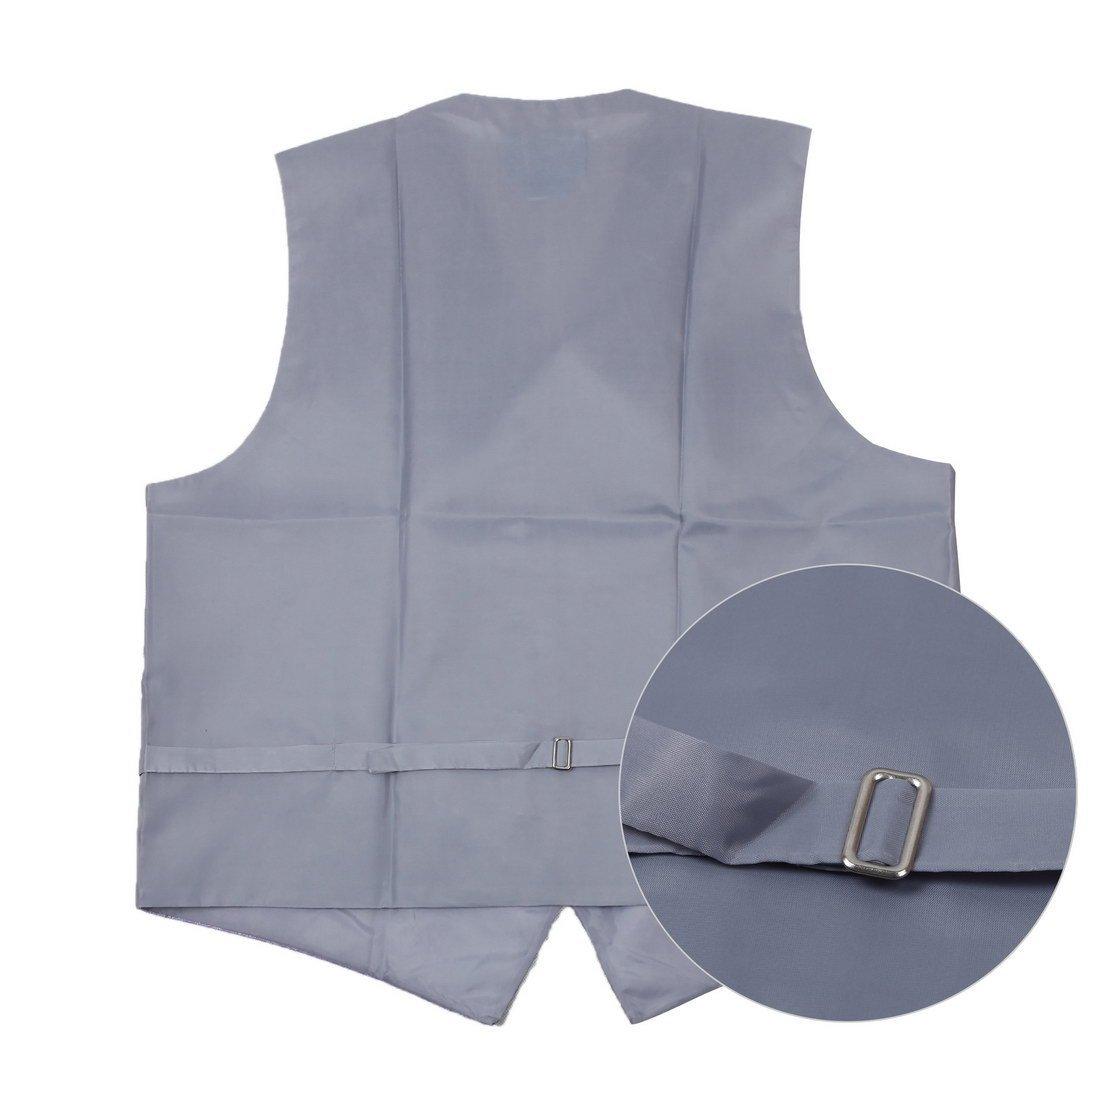 EGC1B01-03 Multi Mens Paisley Waistcoat Woven Microfiber S-3XL Vest By Epoint